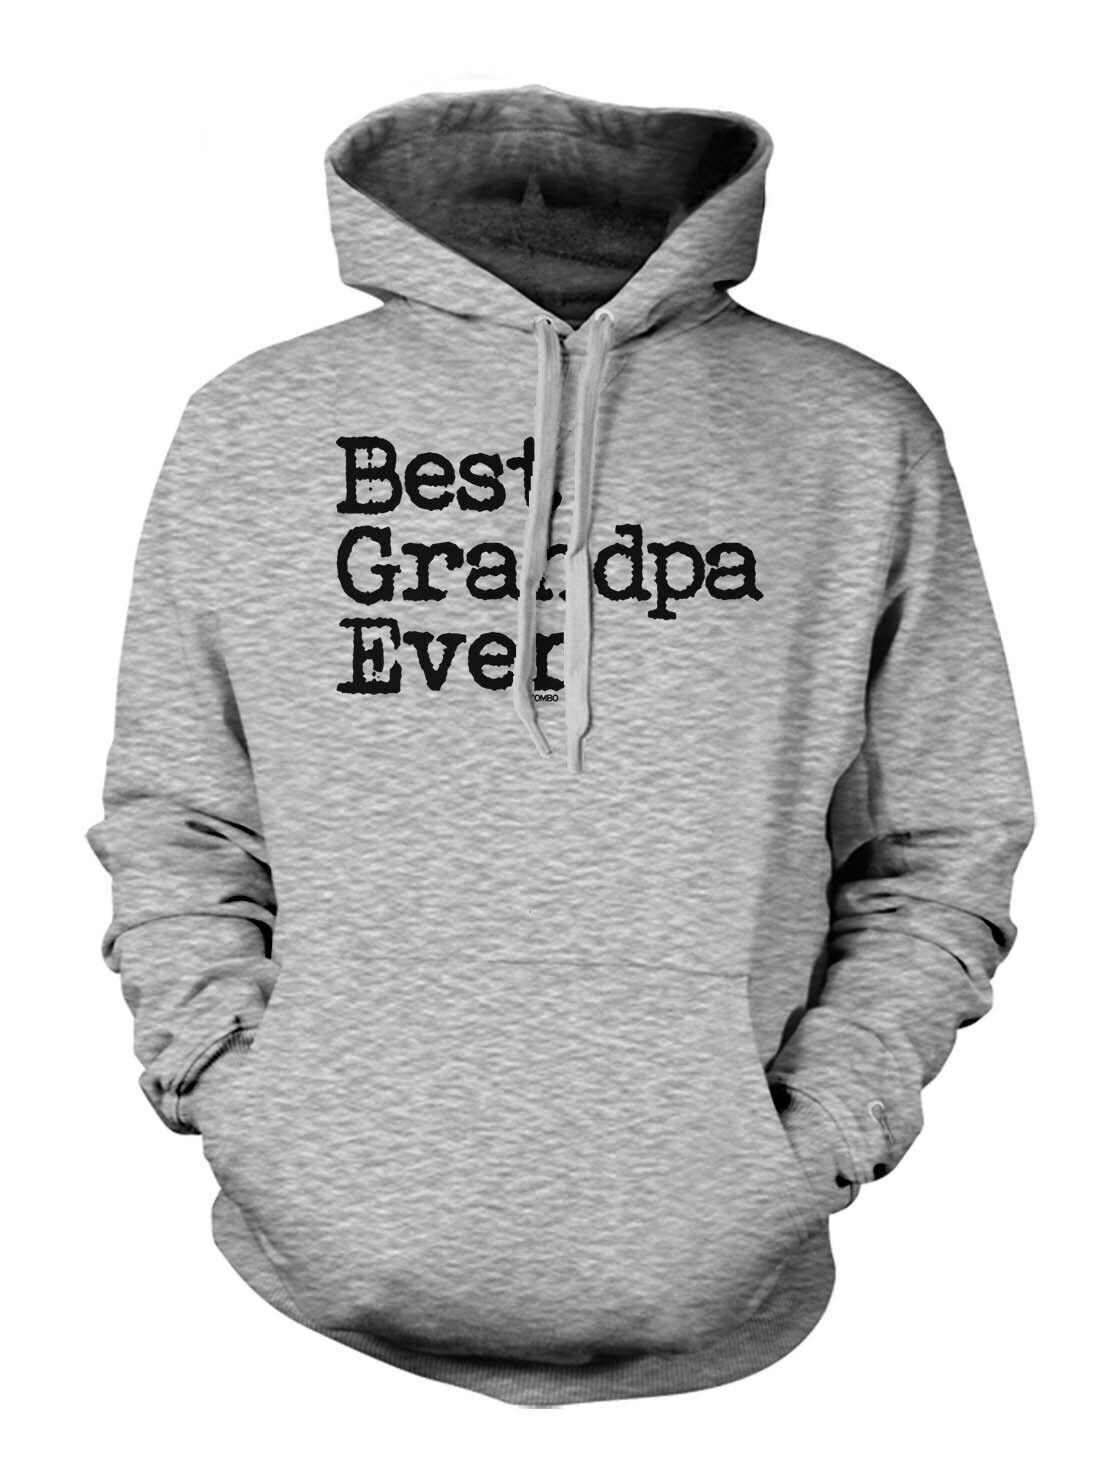 Best Grandpa Ever - Father's Day Dad Birthday Hoodie Sweatshirt